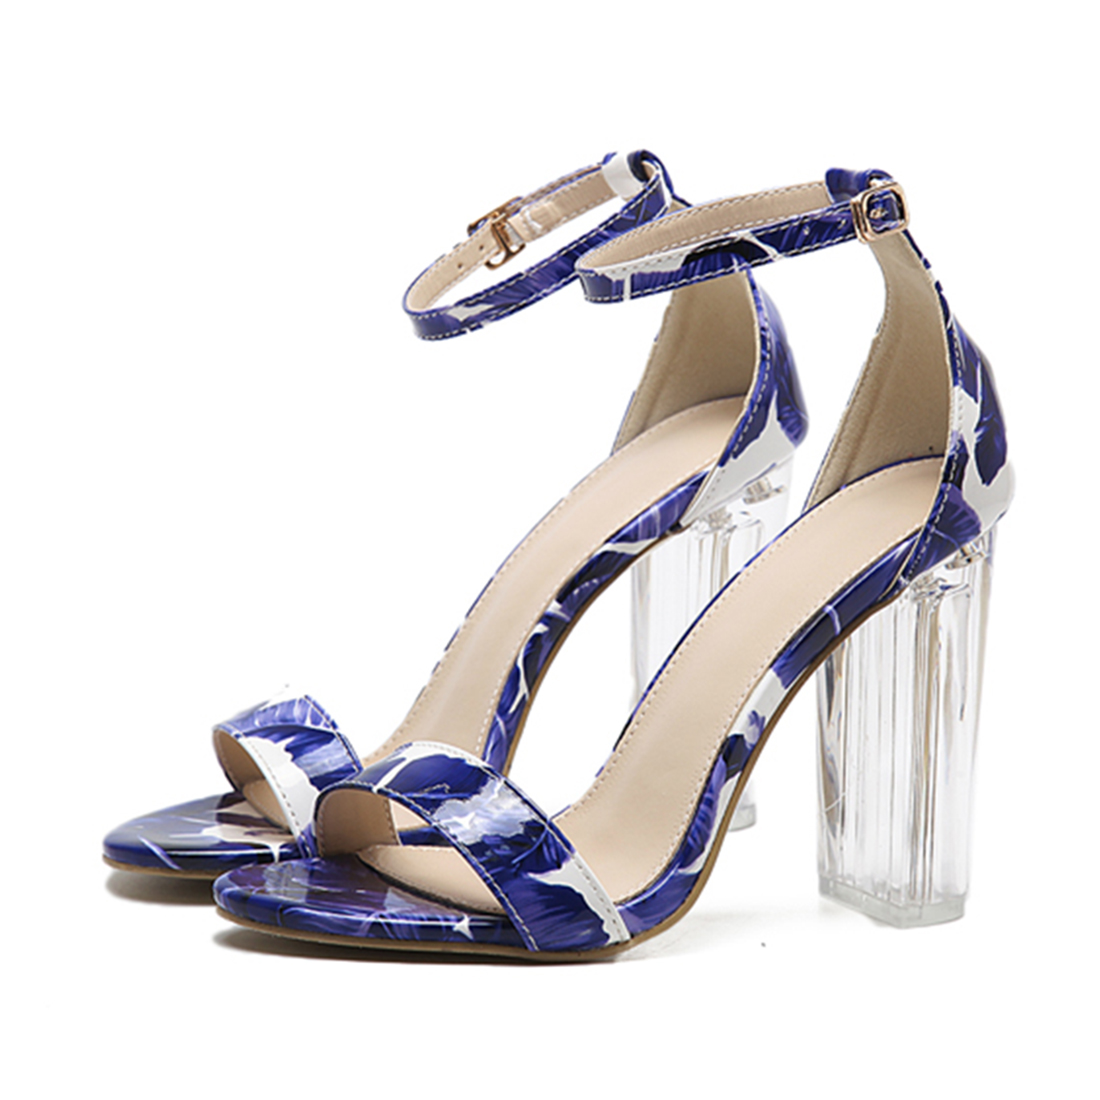 ФОТО New design women clear sandals crystal high heel buckle T-strap women party shoes transparent women print flower wedding sandals